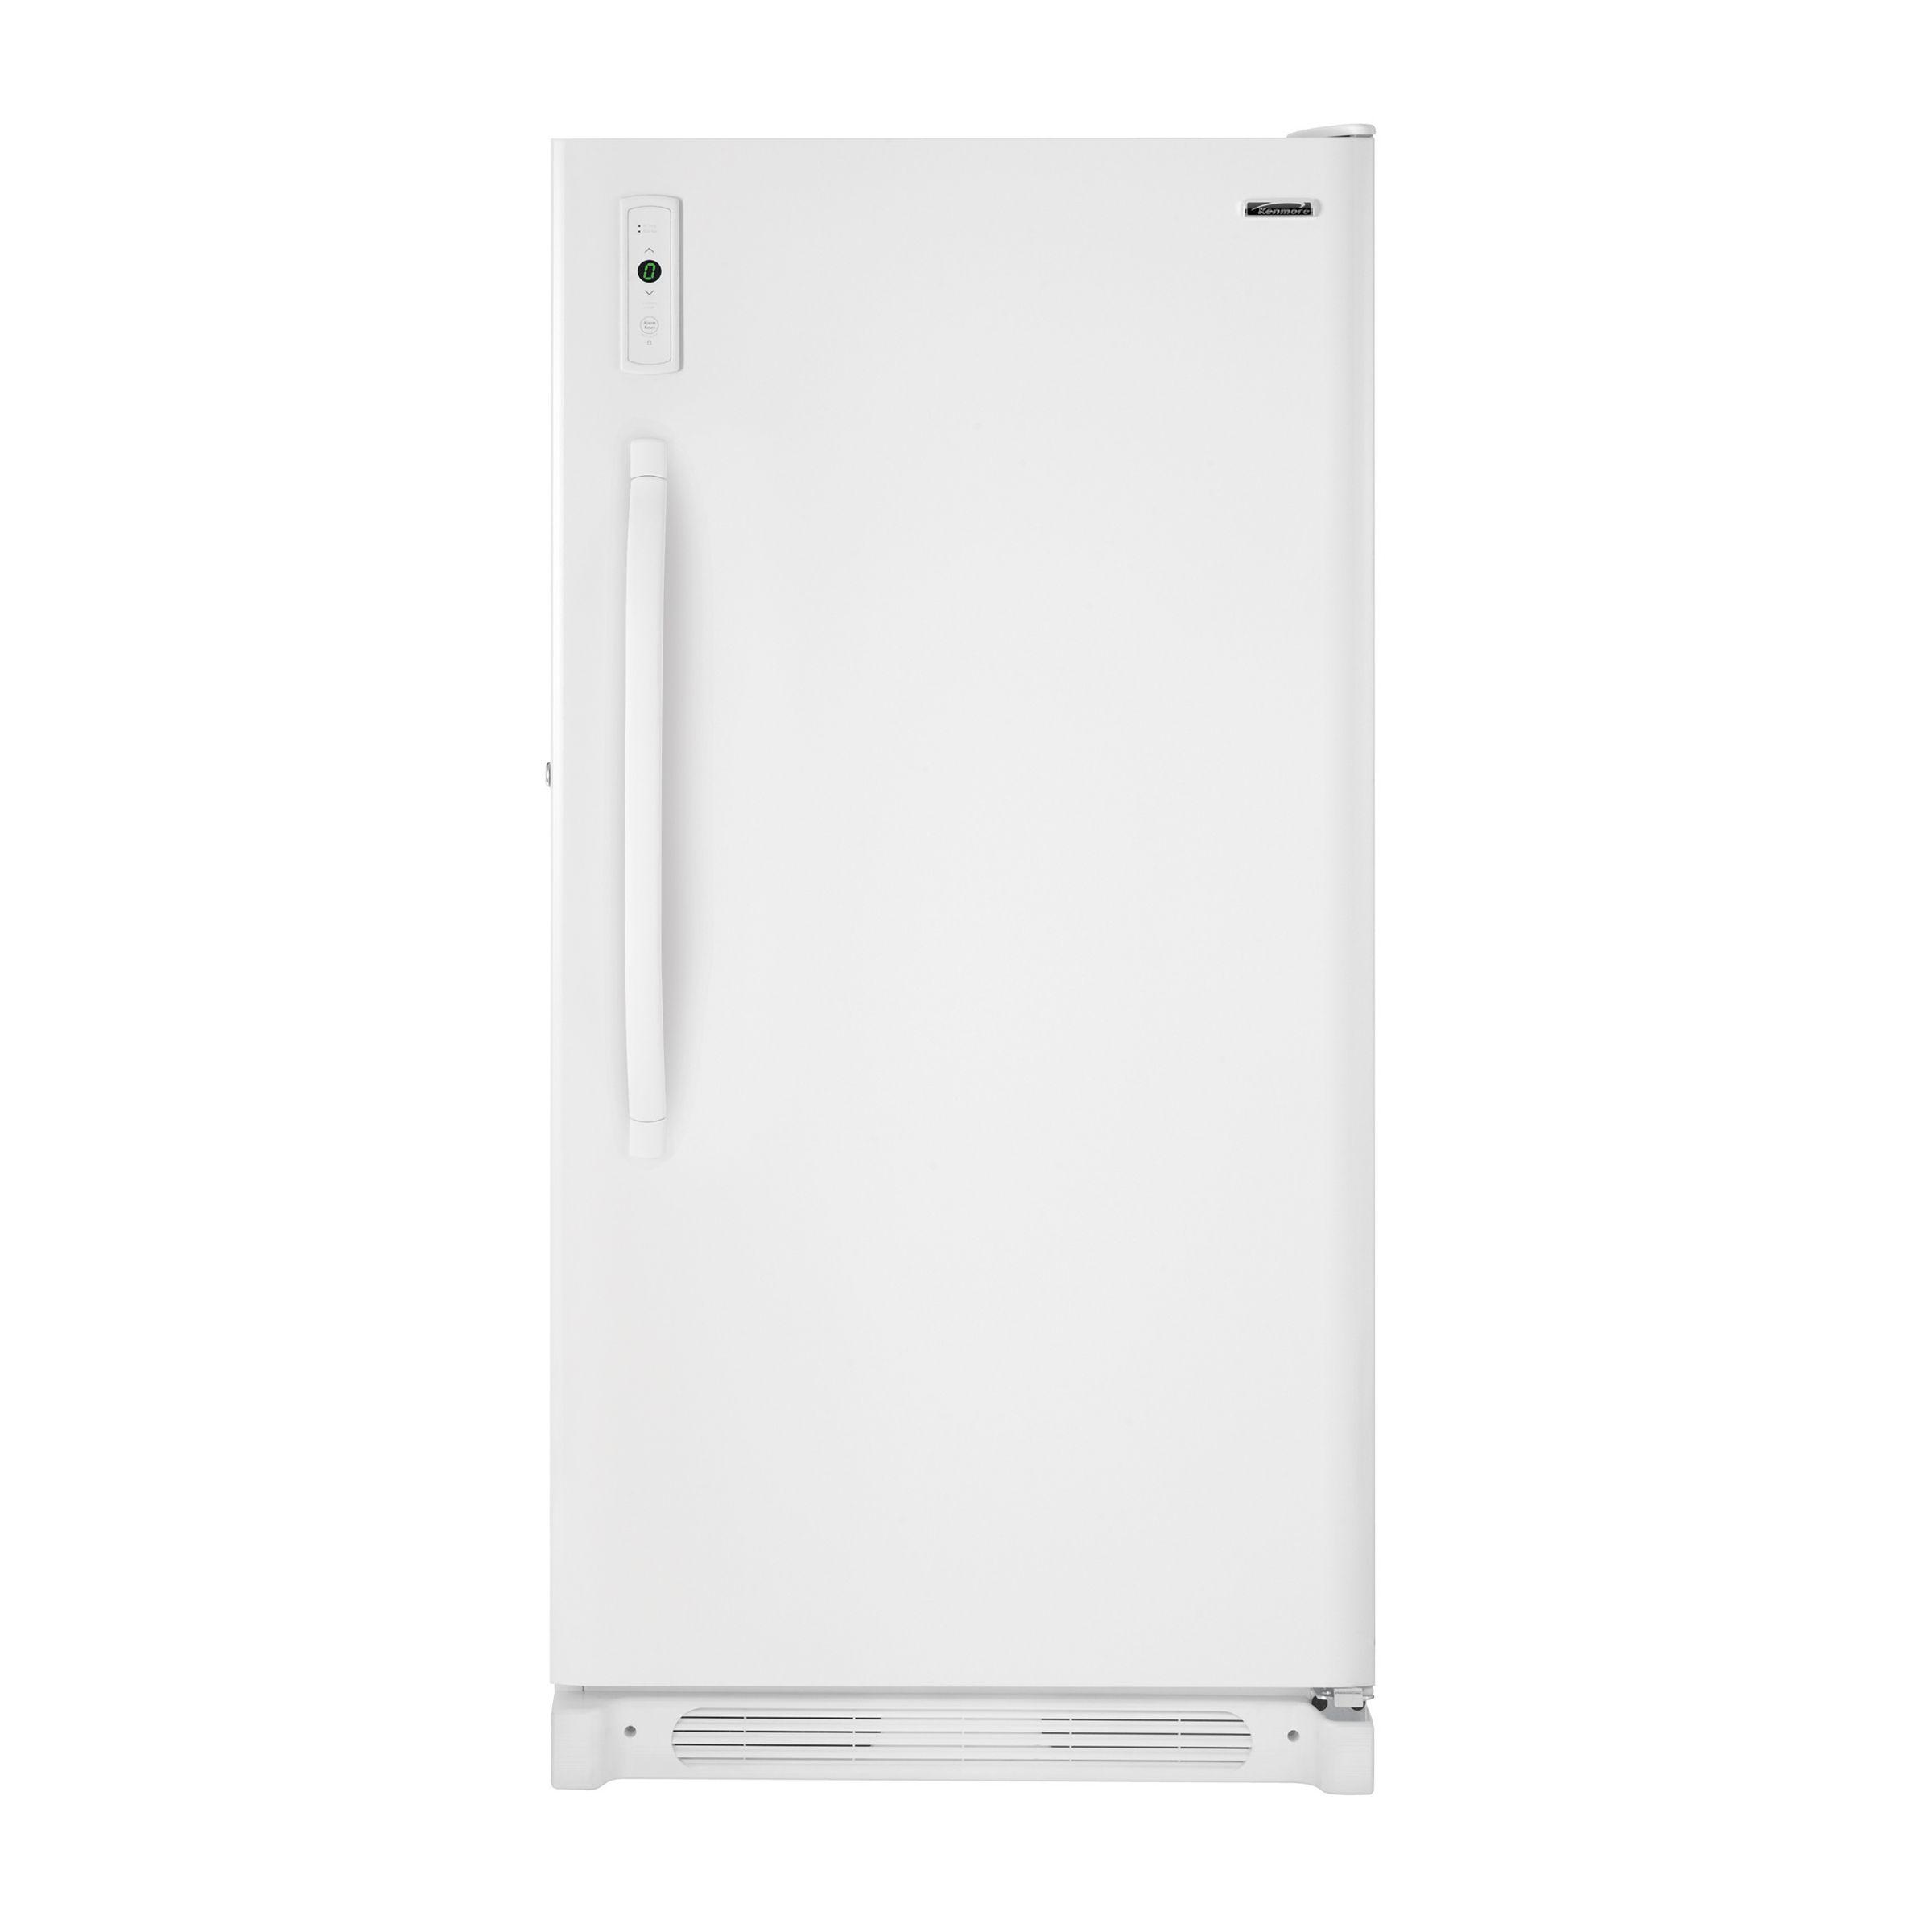 medium resolution of kenmore freezer model 253 wiring diagram wiring diagram m9 sears freezer wiring diagram